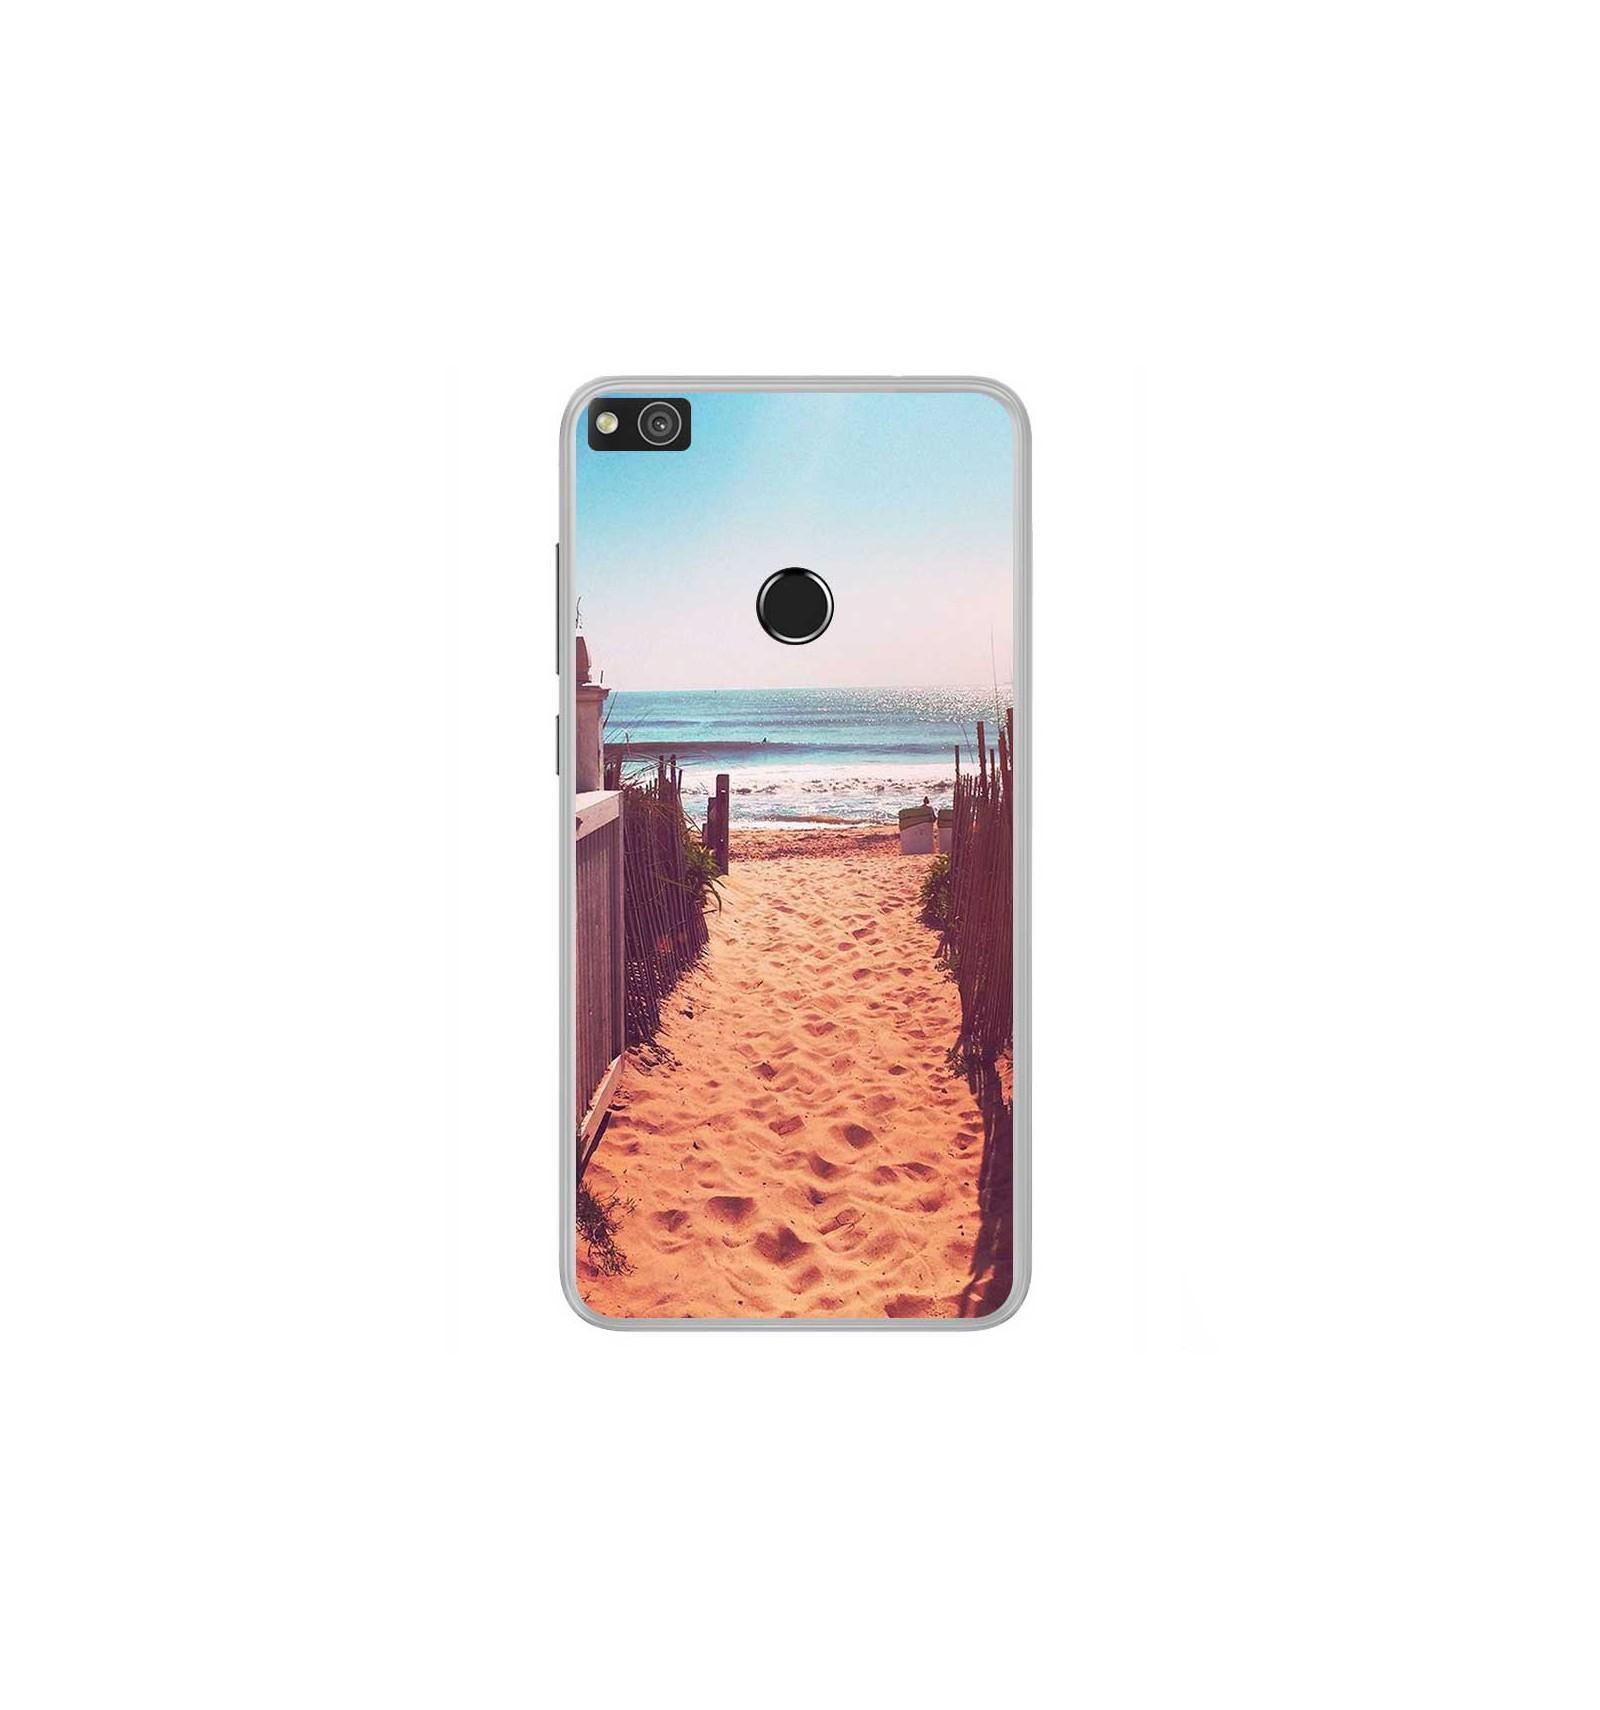 coque p8 lite 2017 huawei plage